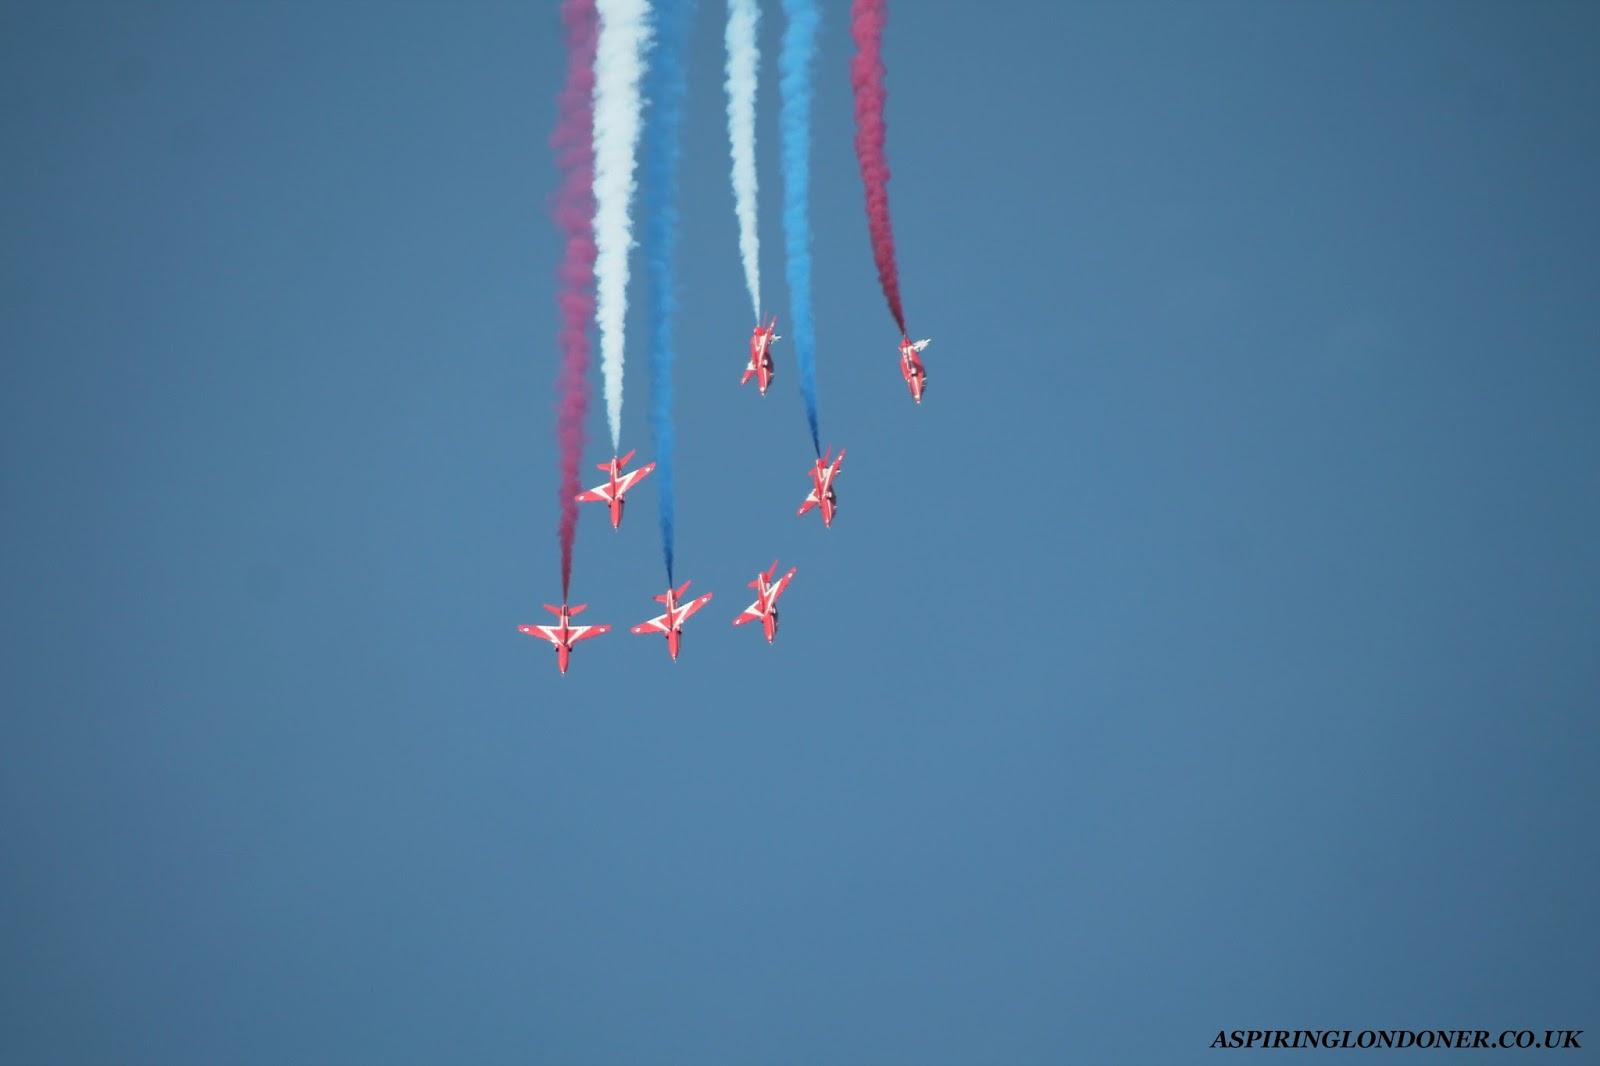 Sunderland International Airshow Red Arrows - Aspiring Londoner